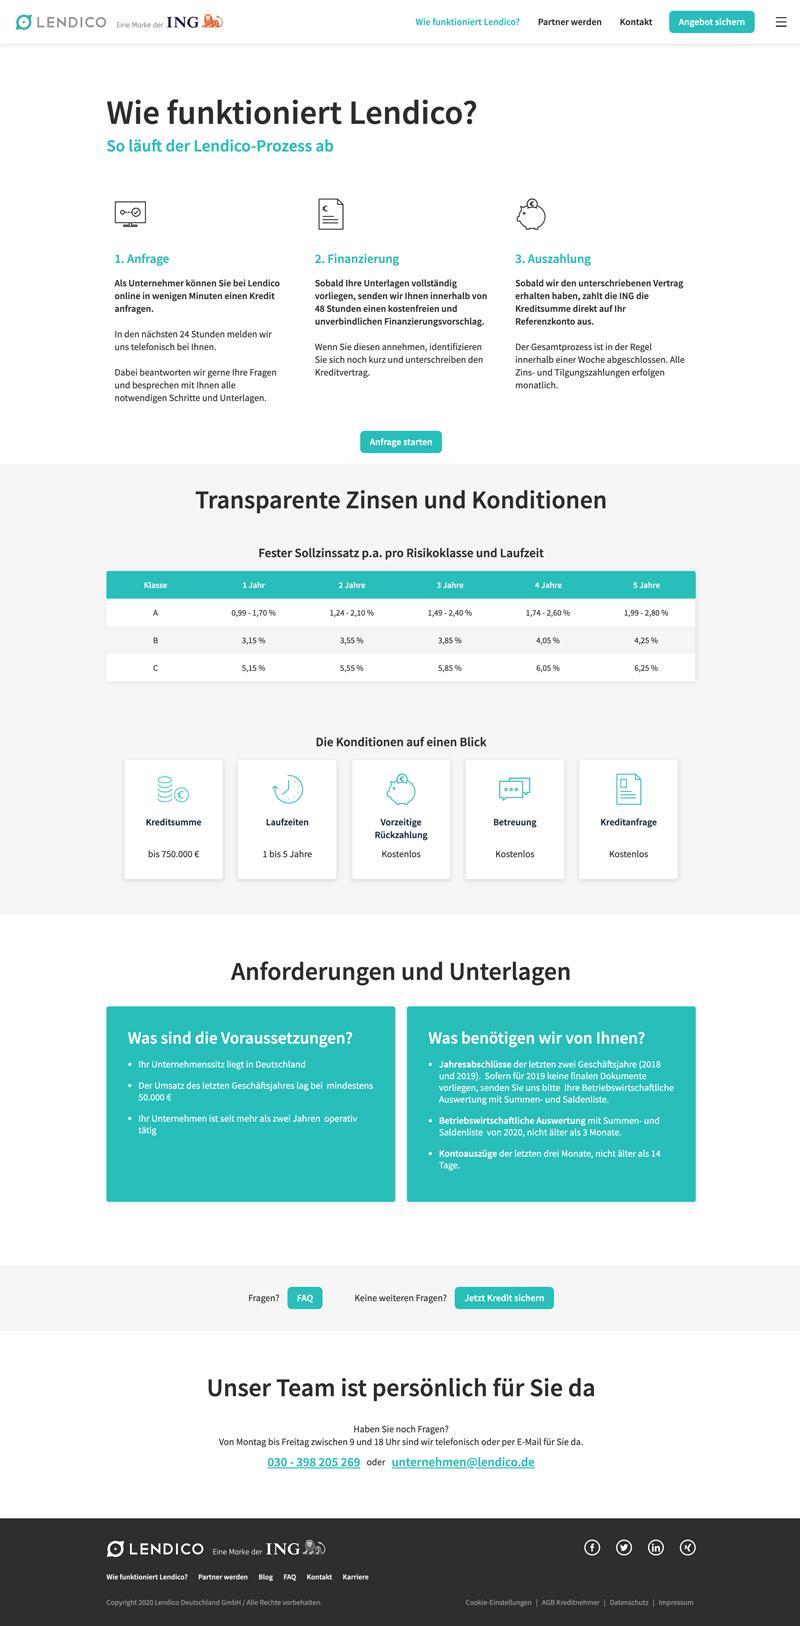 Wie funktioniert Lendico? - Desktop - lendico.de